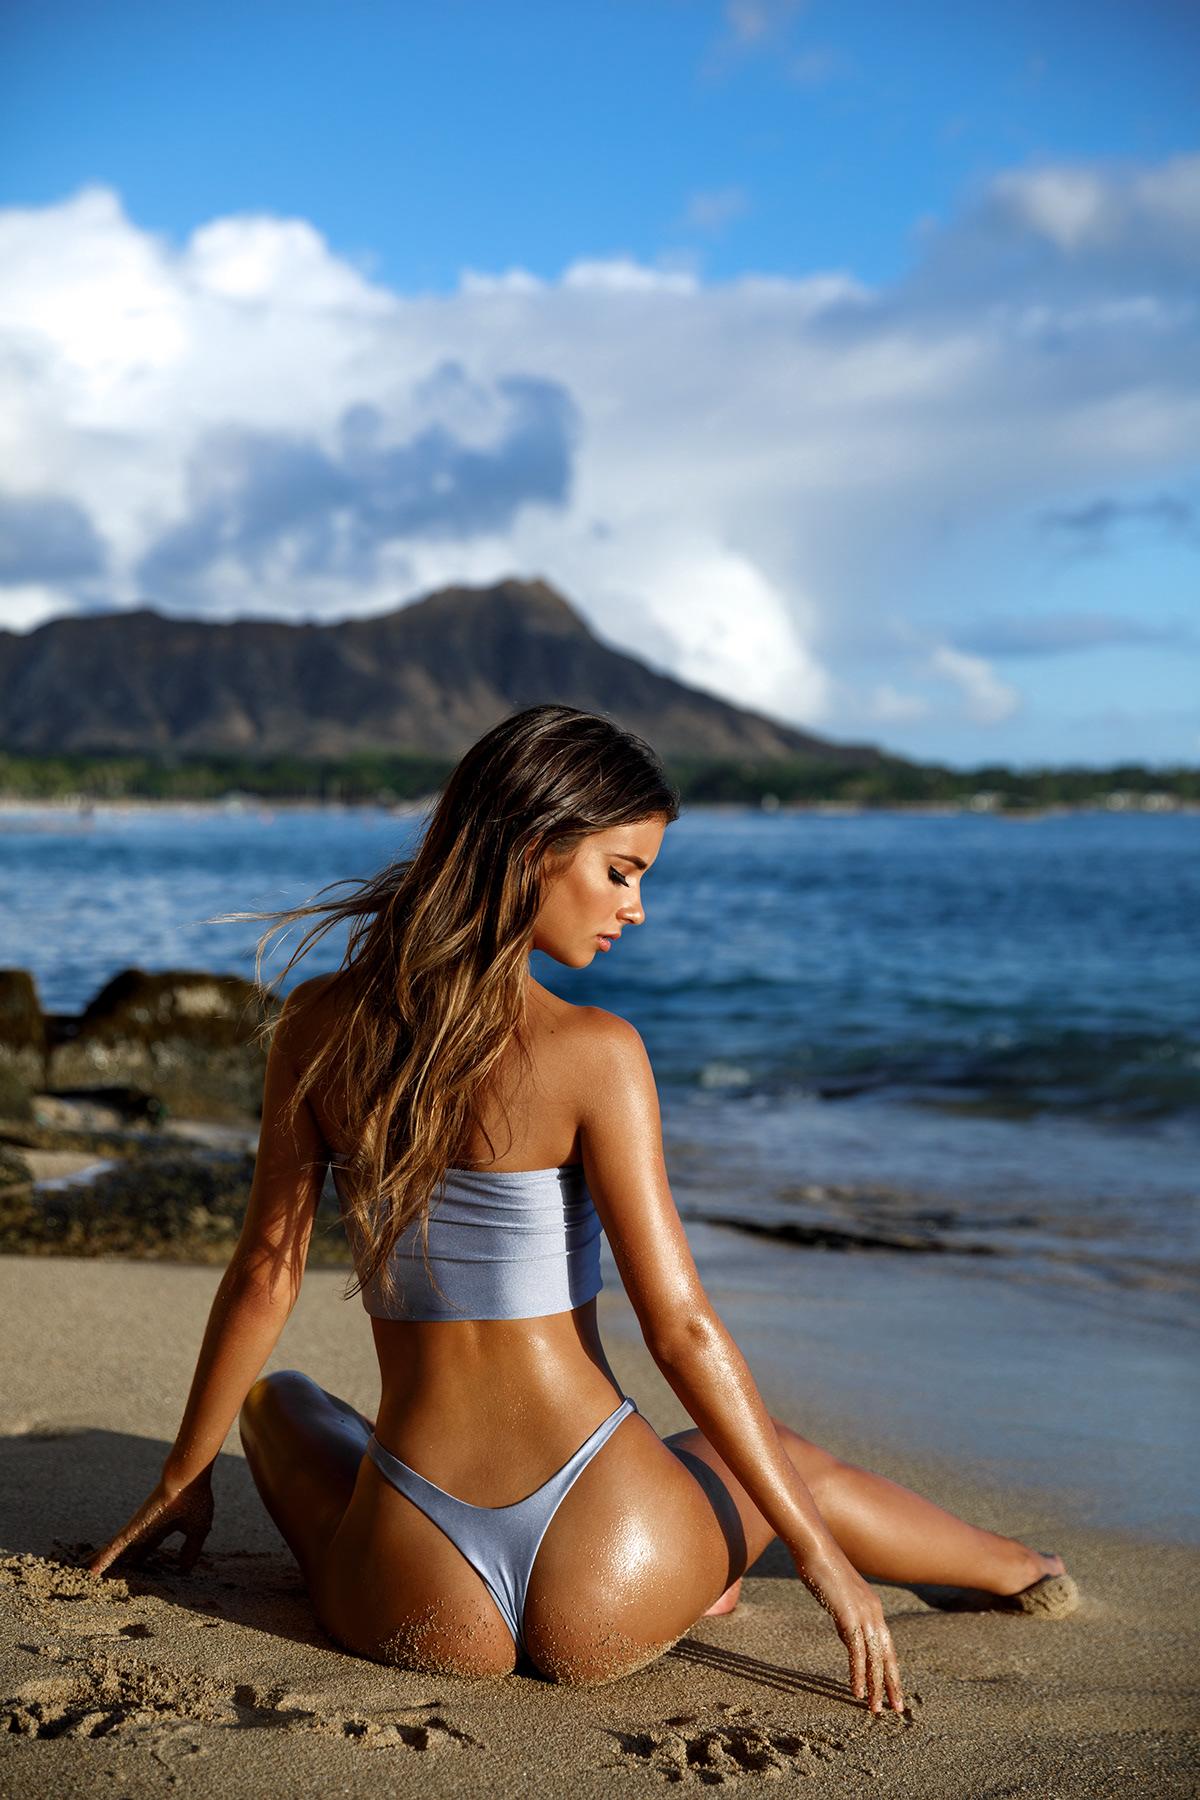 pics seyfried moore nude julianne amanda